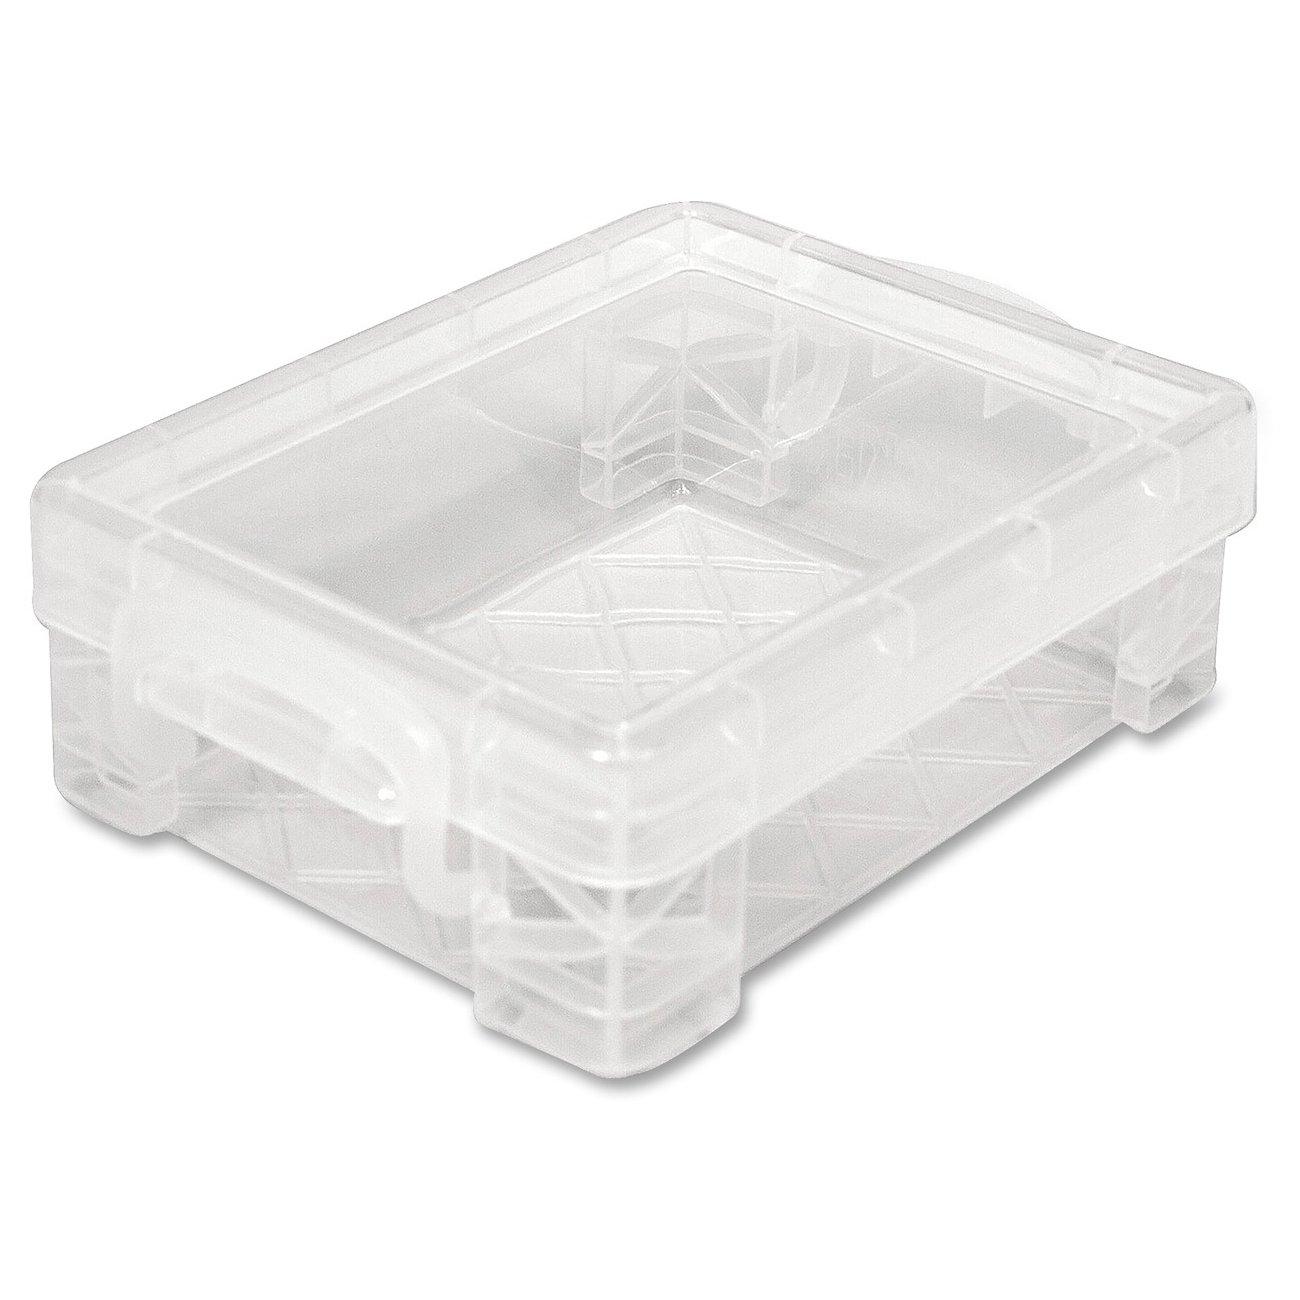 Advantus Super Stacker Crayon Box, Clear, 40311